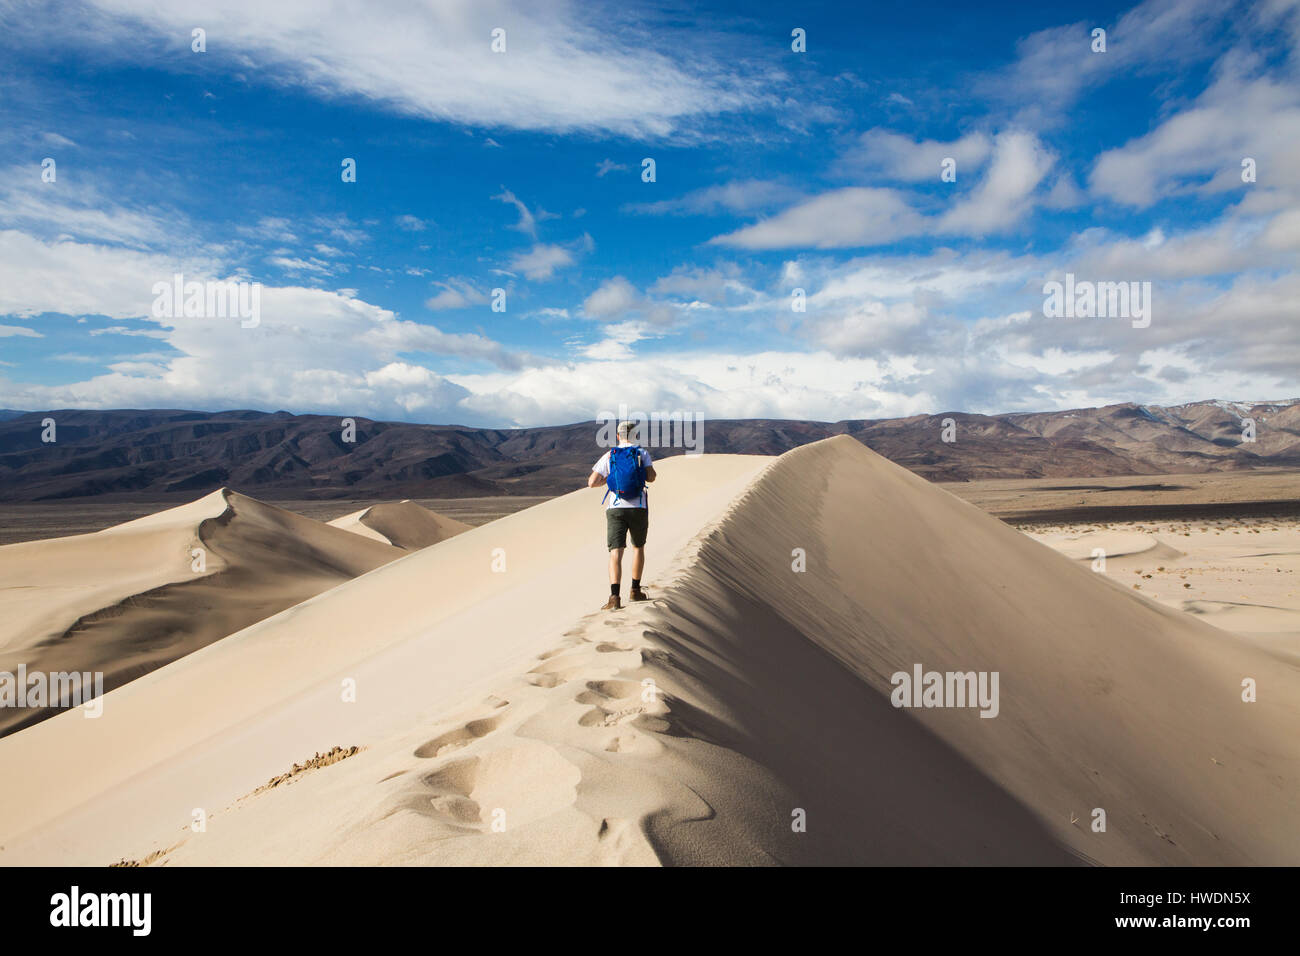 Trekker walking in Death Valley National Park, California, US - Stock Image